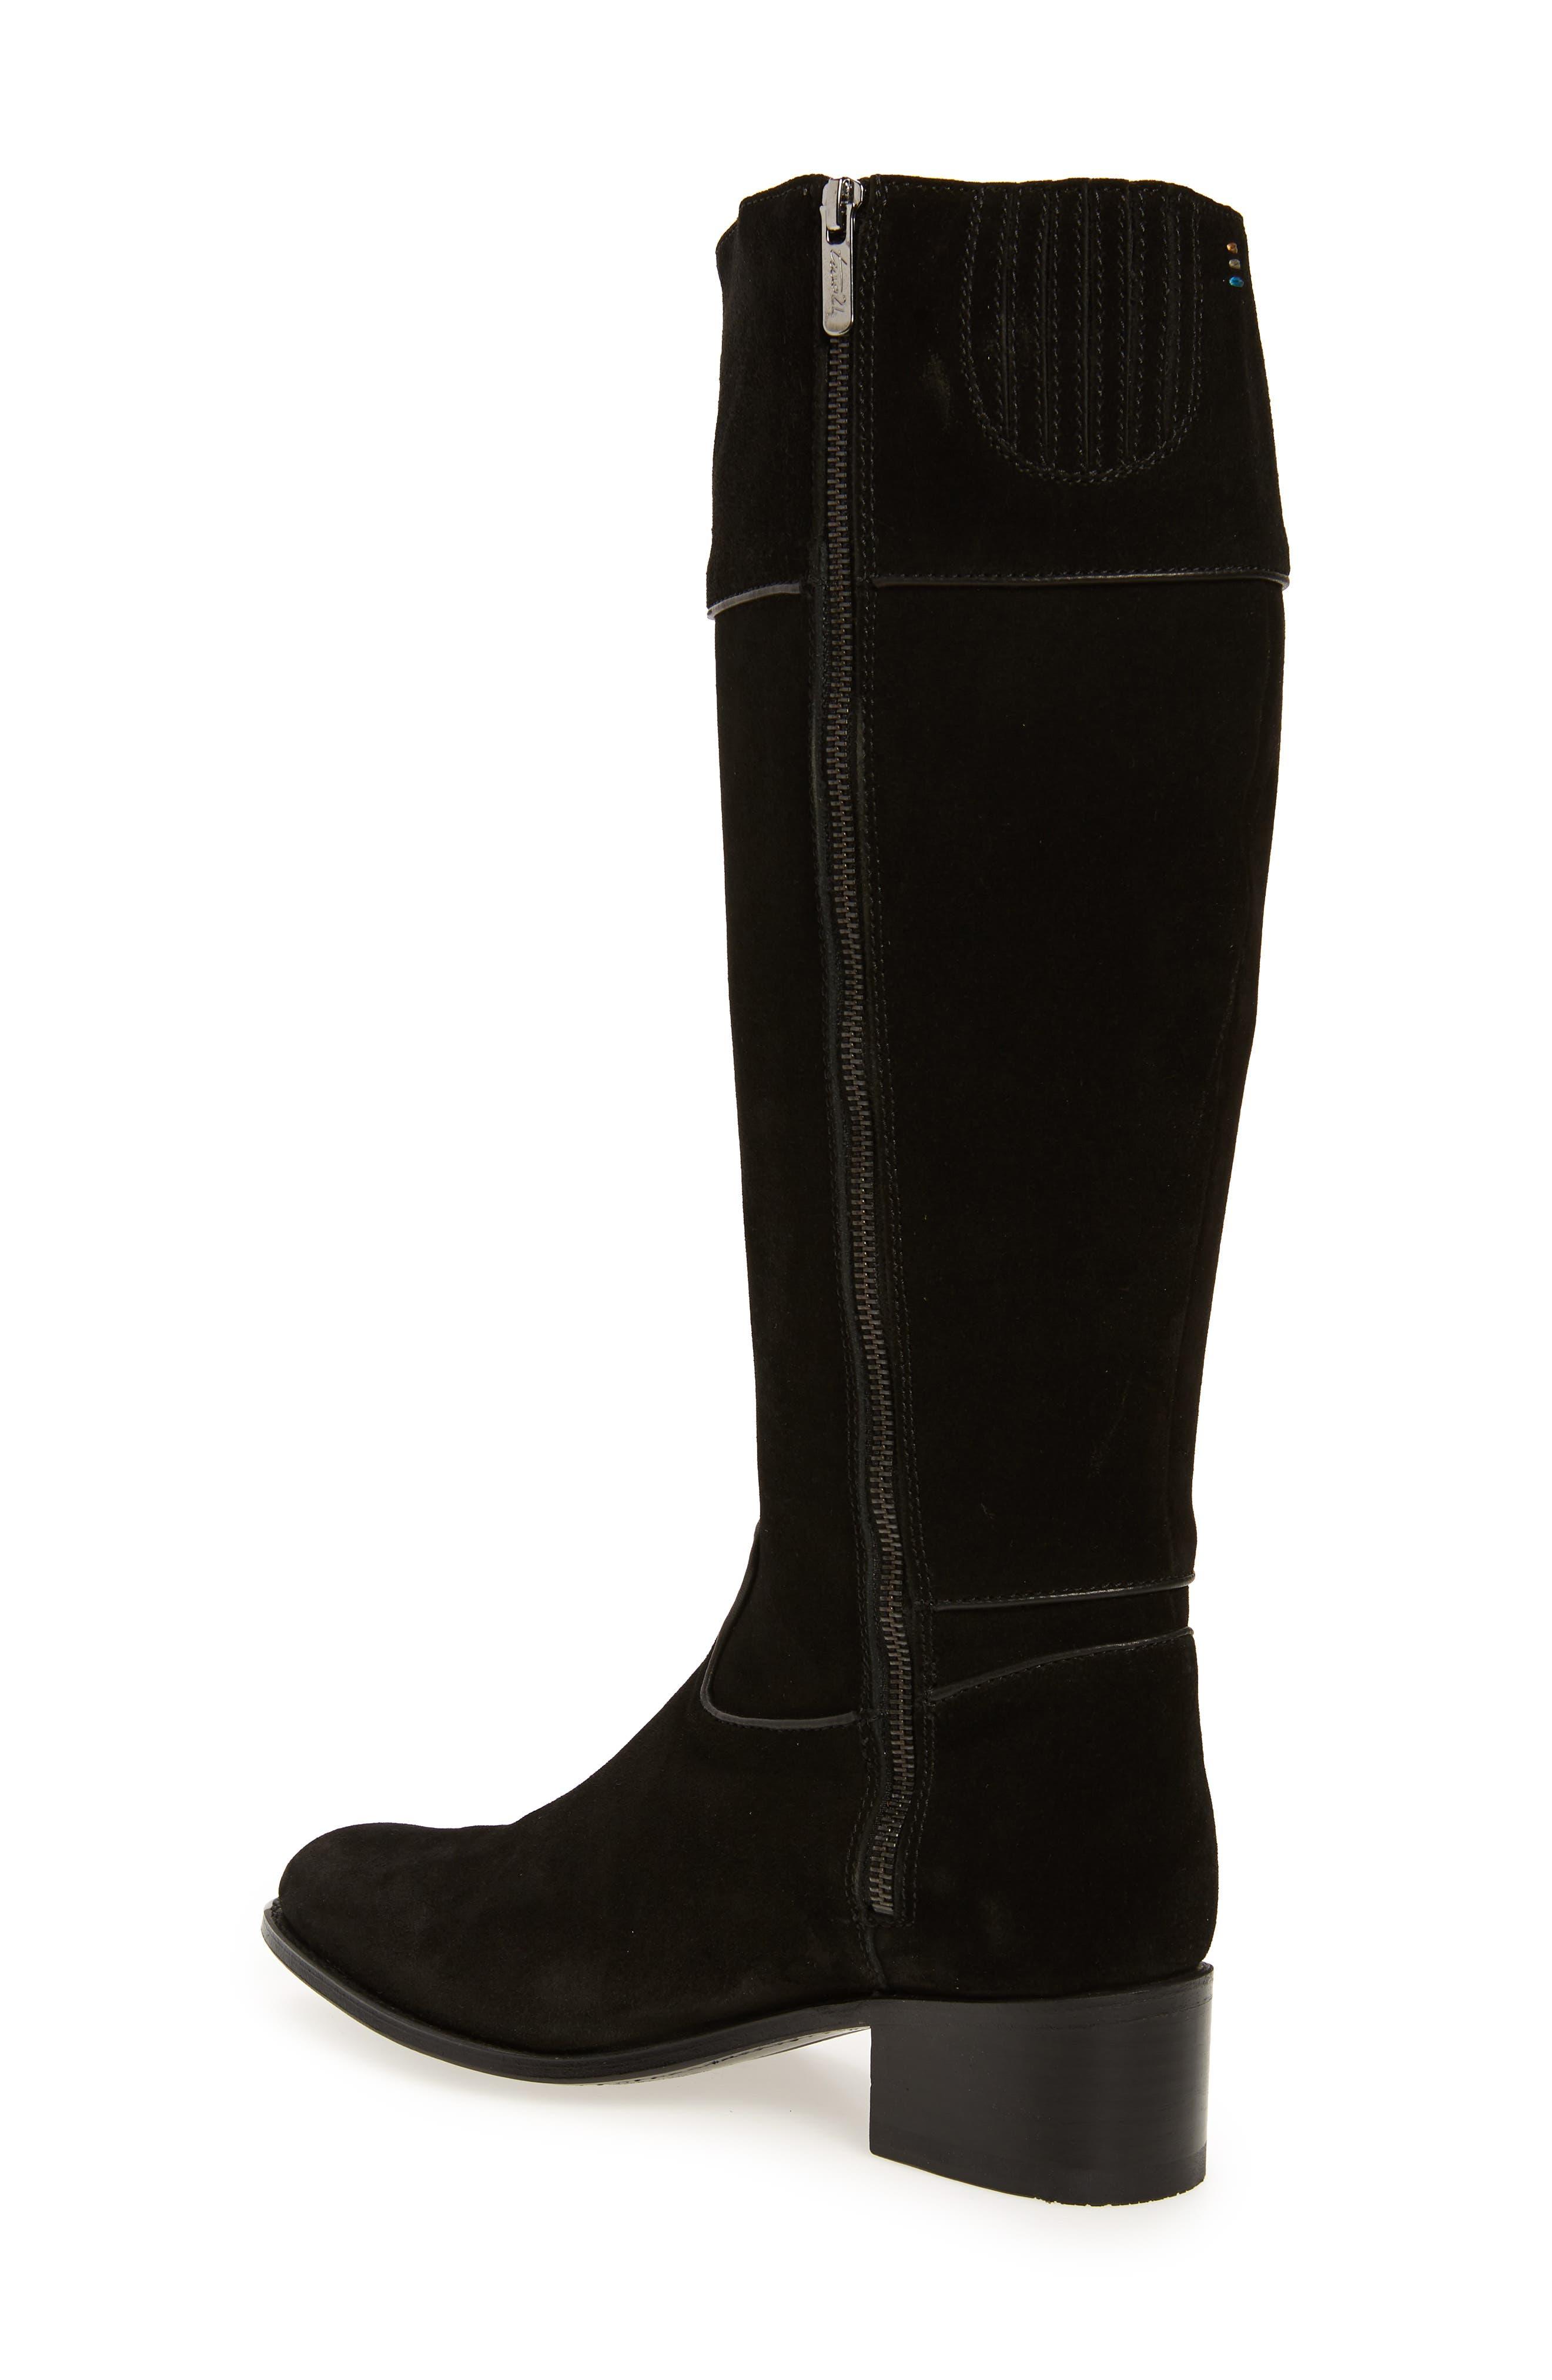 Alternate Image 2  - Ariat Barcelona Boot (Women)